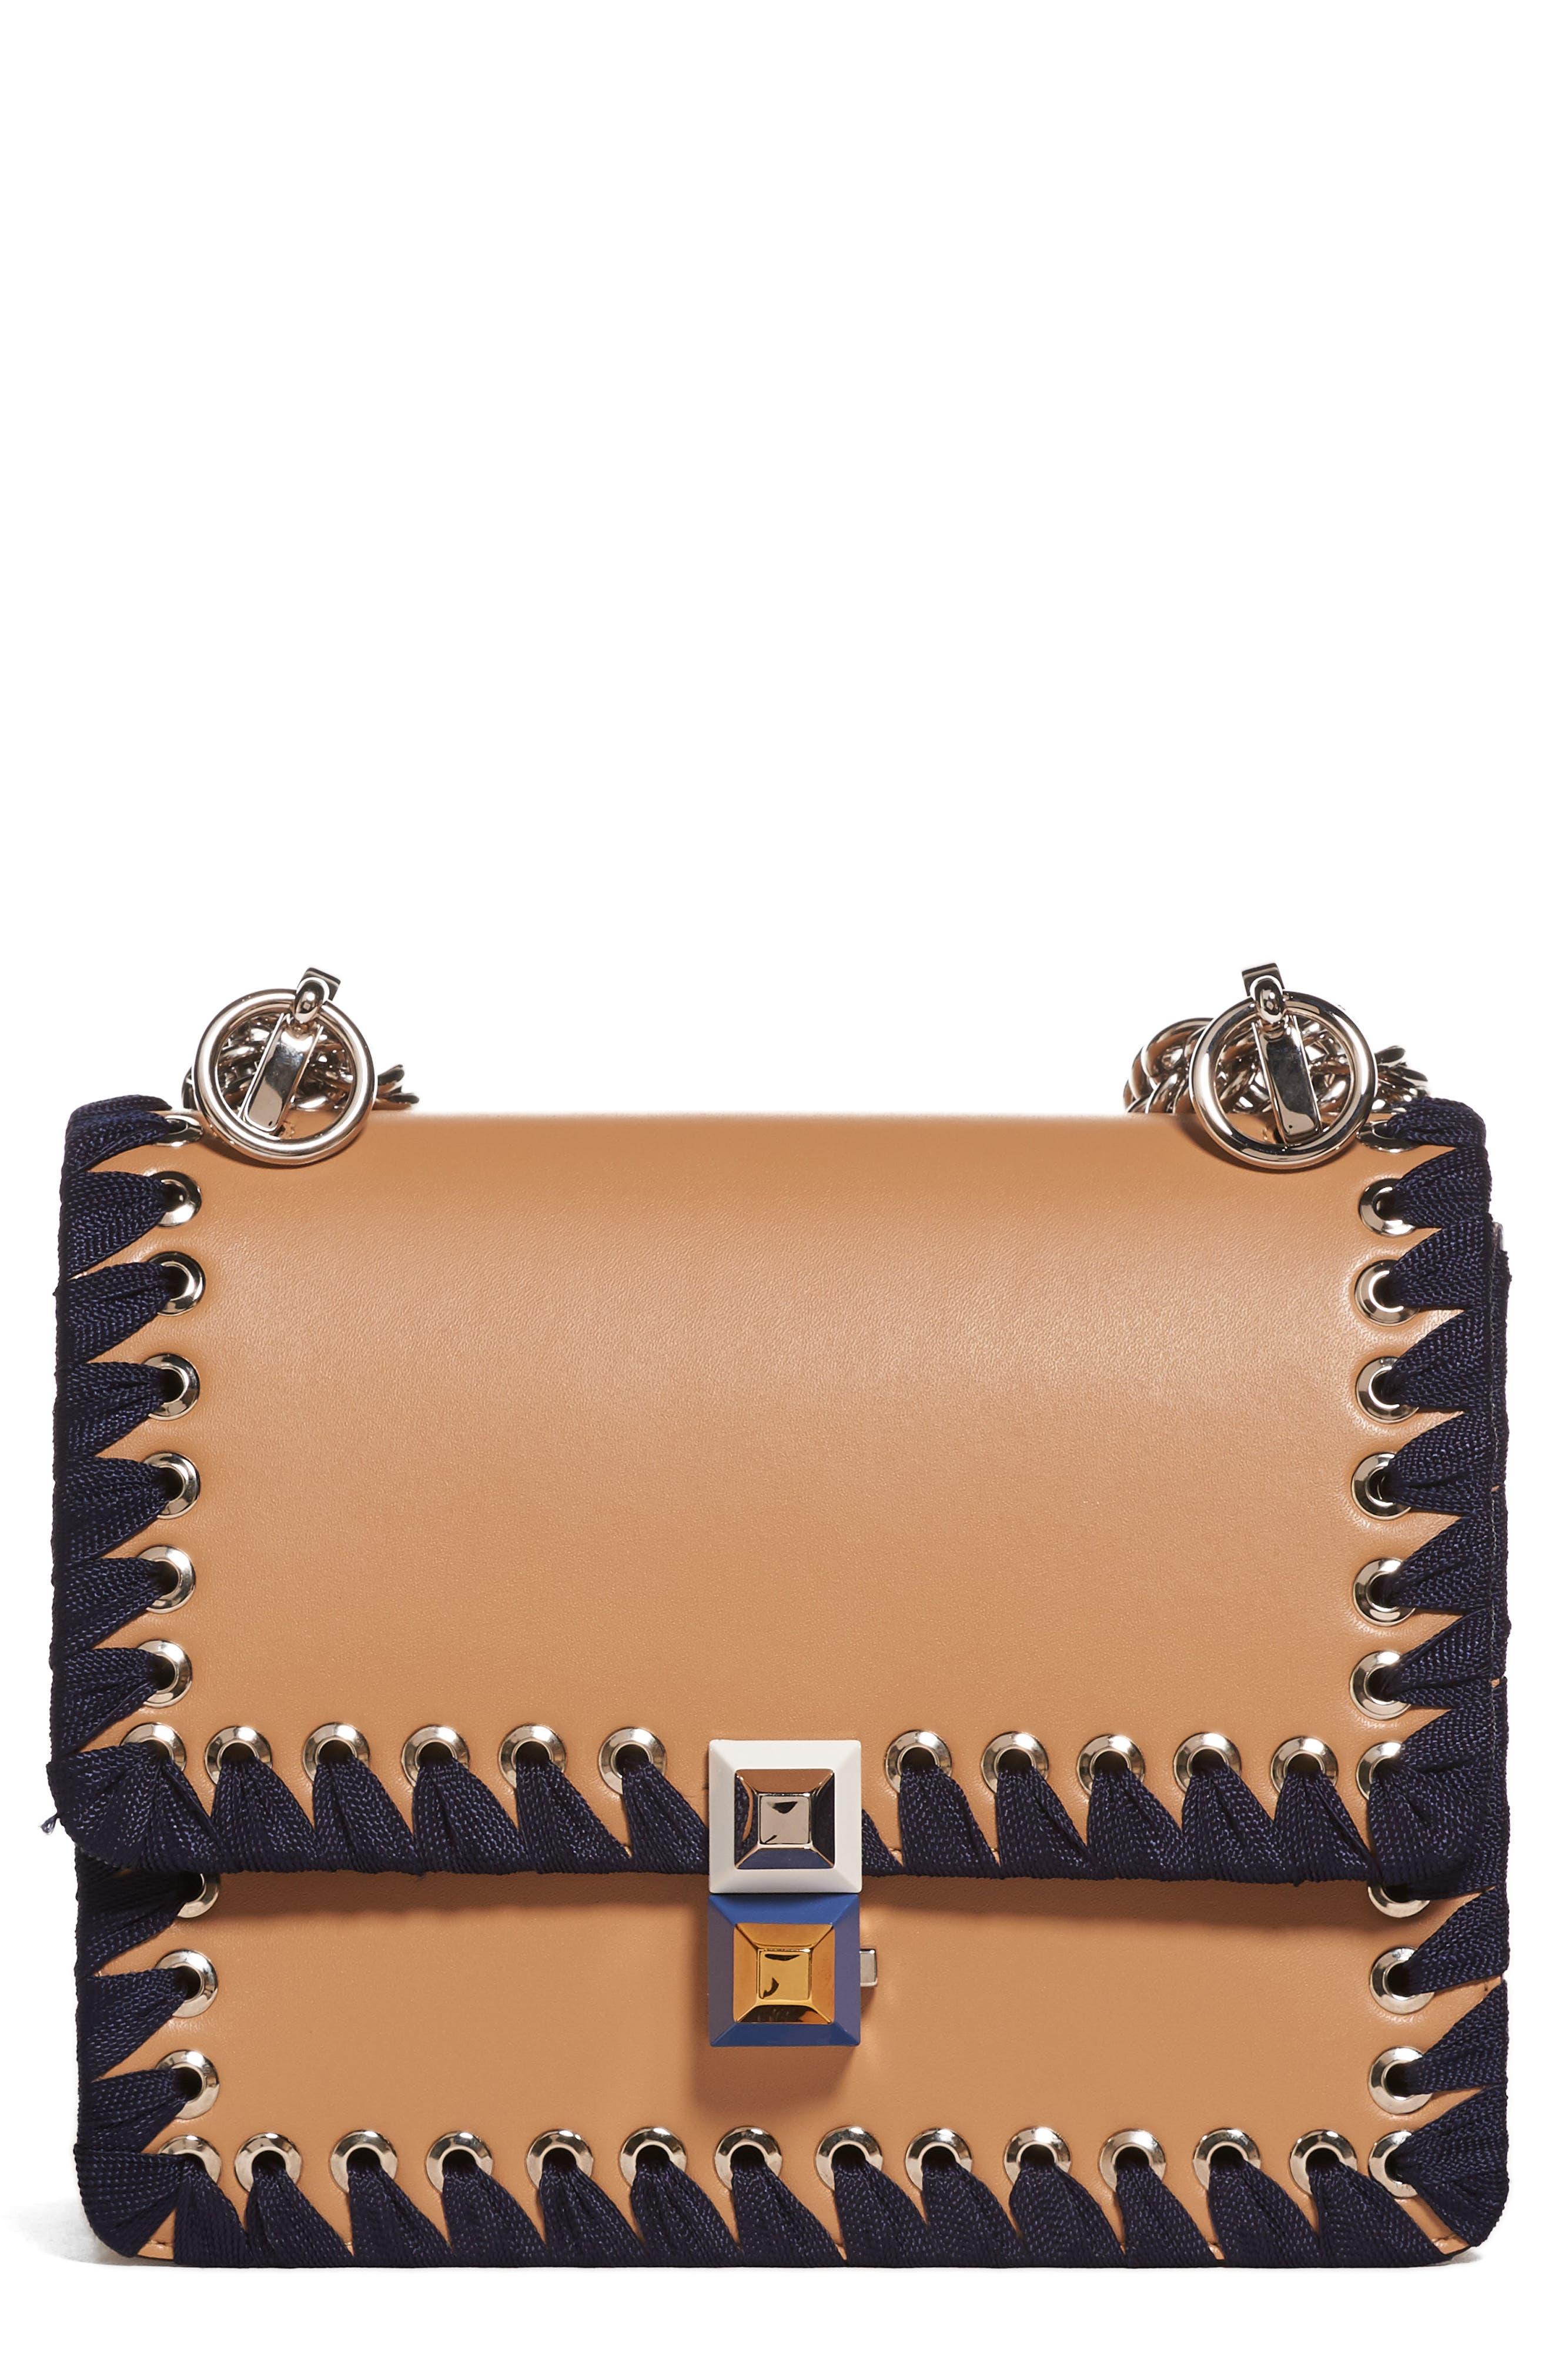 Fendi Small Kan I Whipstitch Leather Shoulder Bag